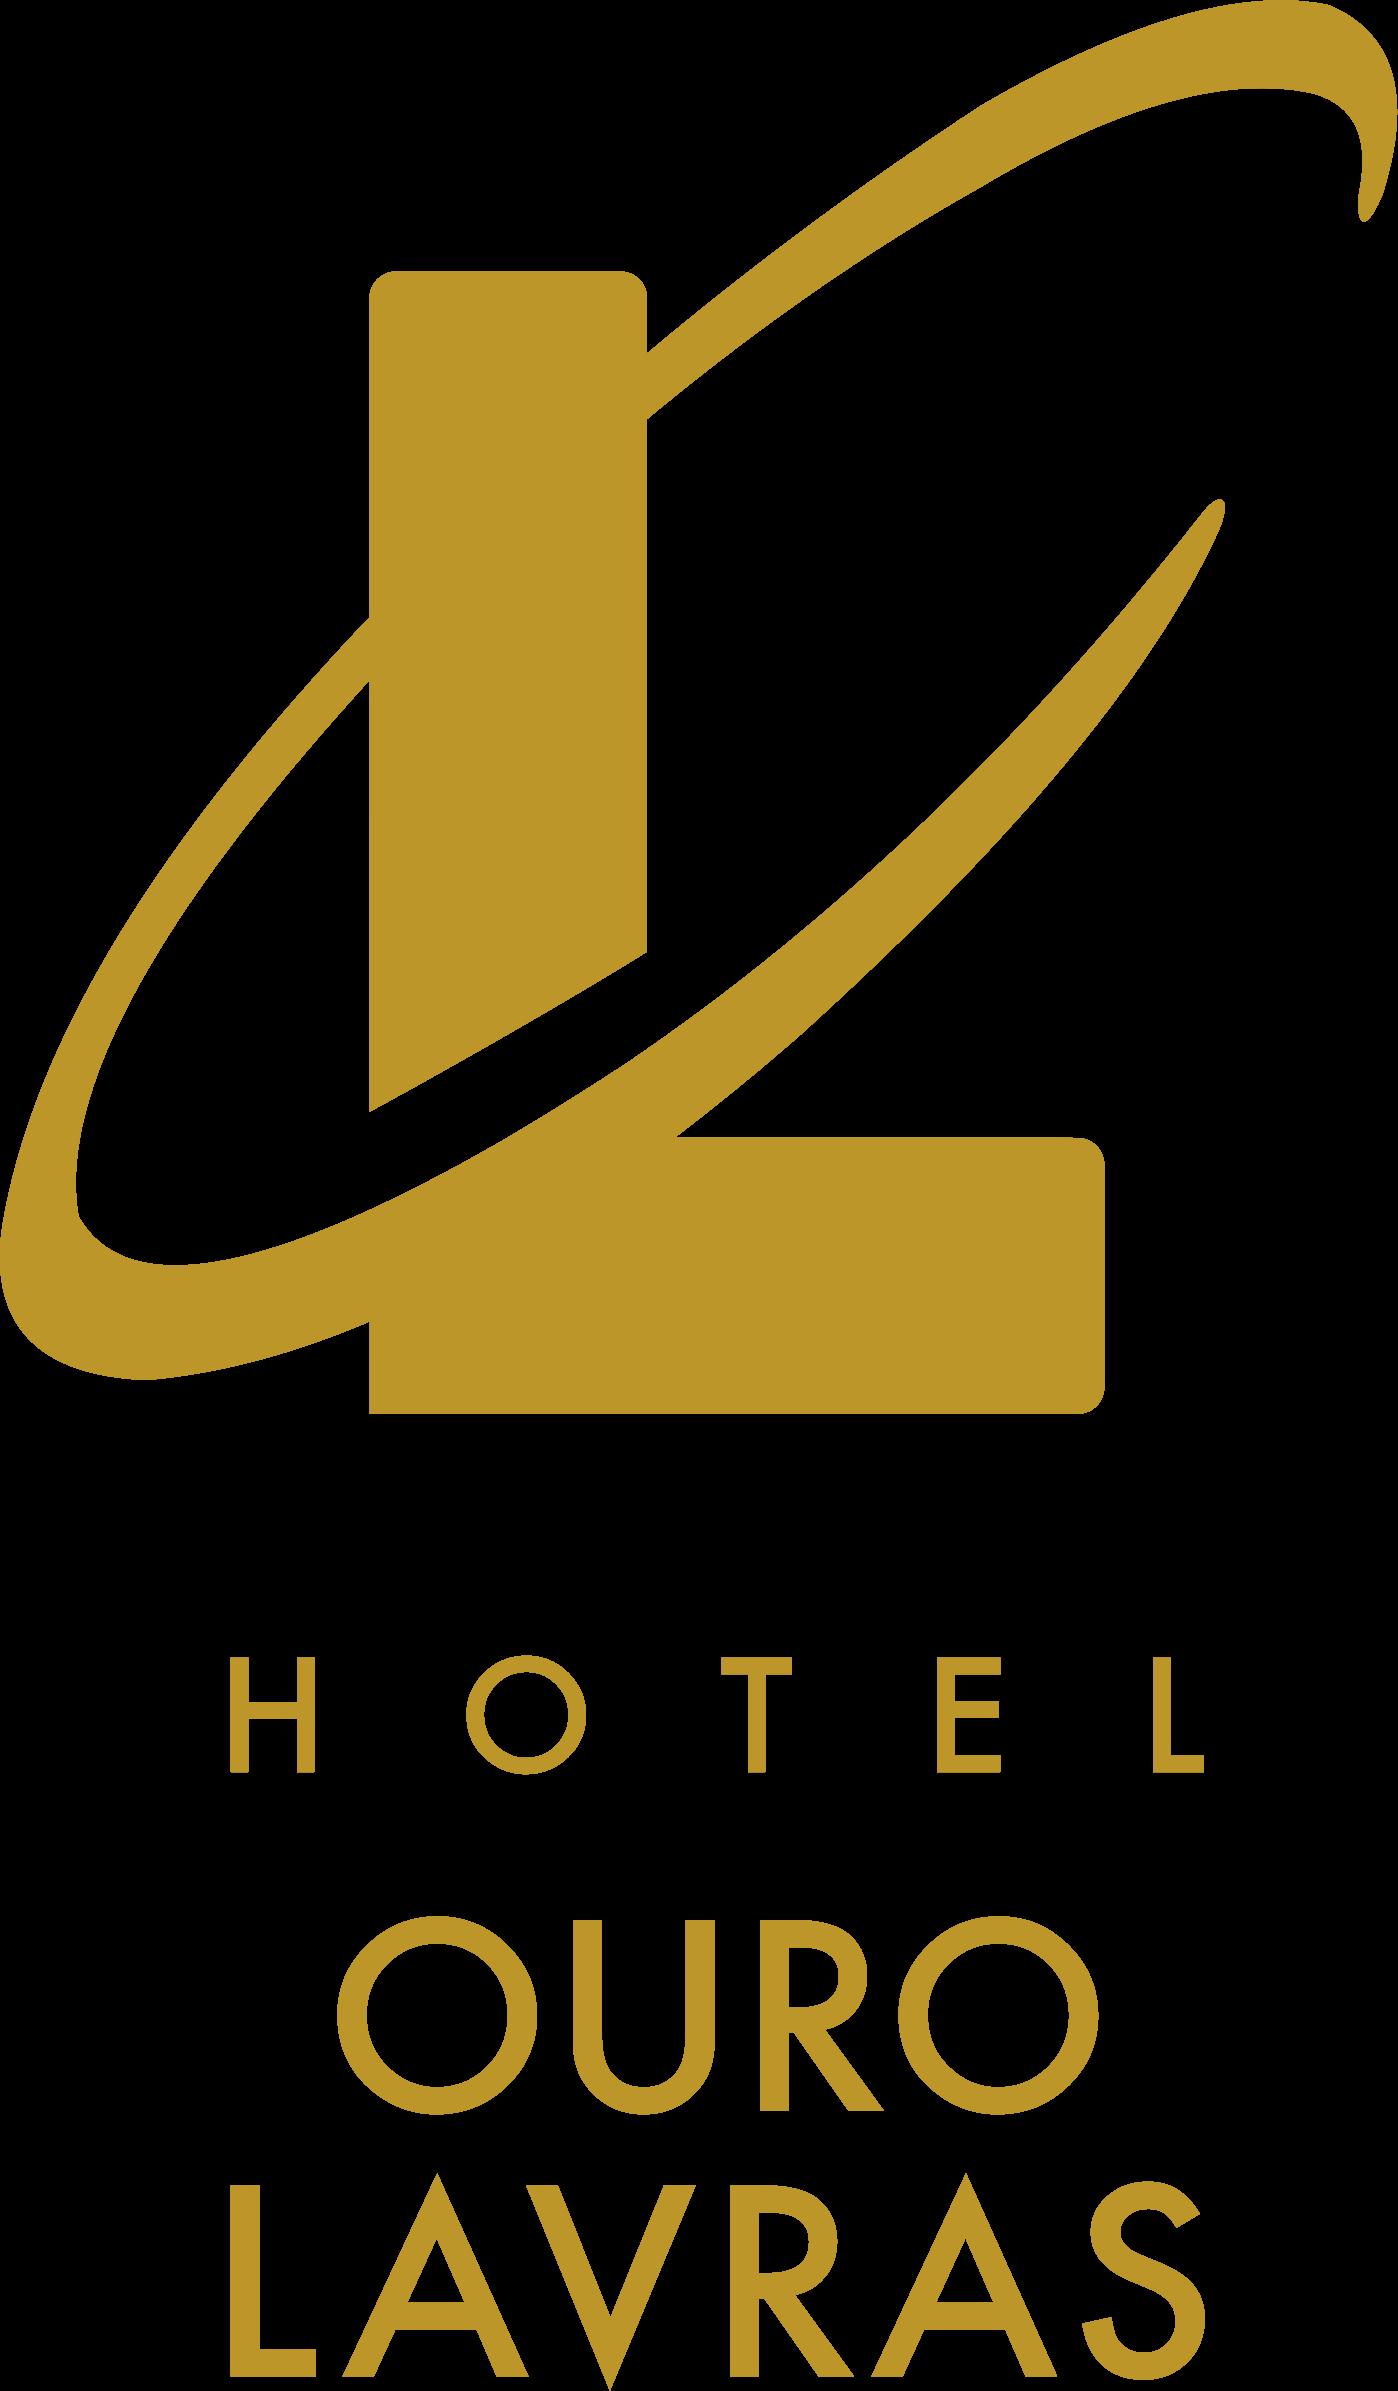 Hotel Ouro Lavras